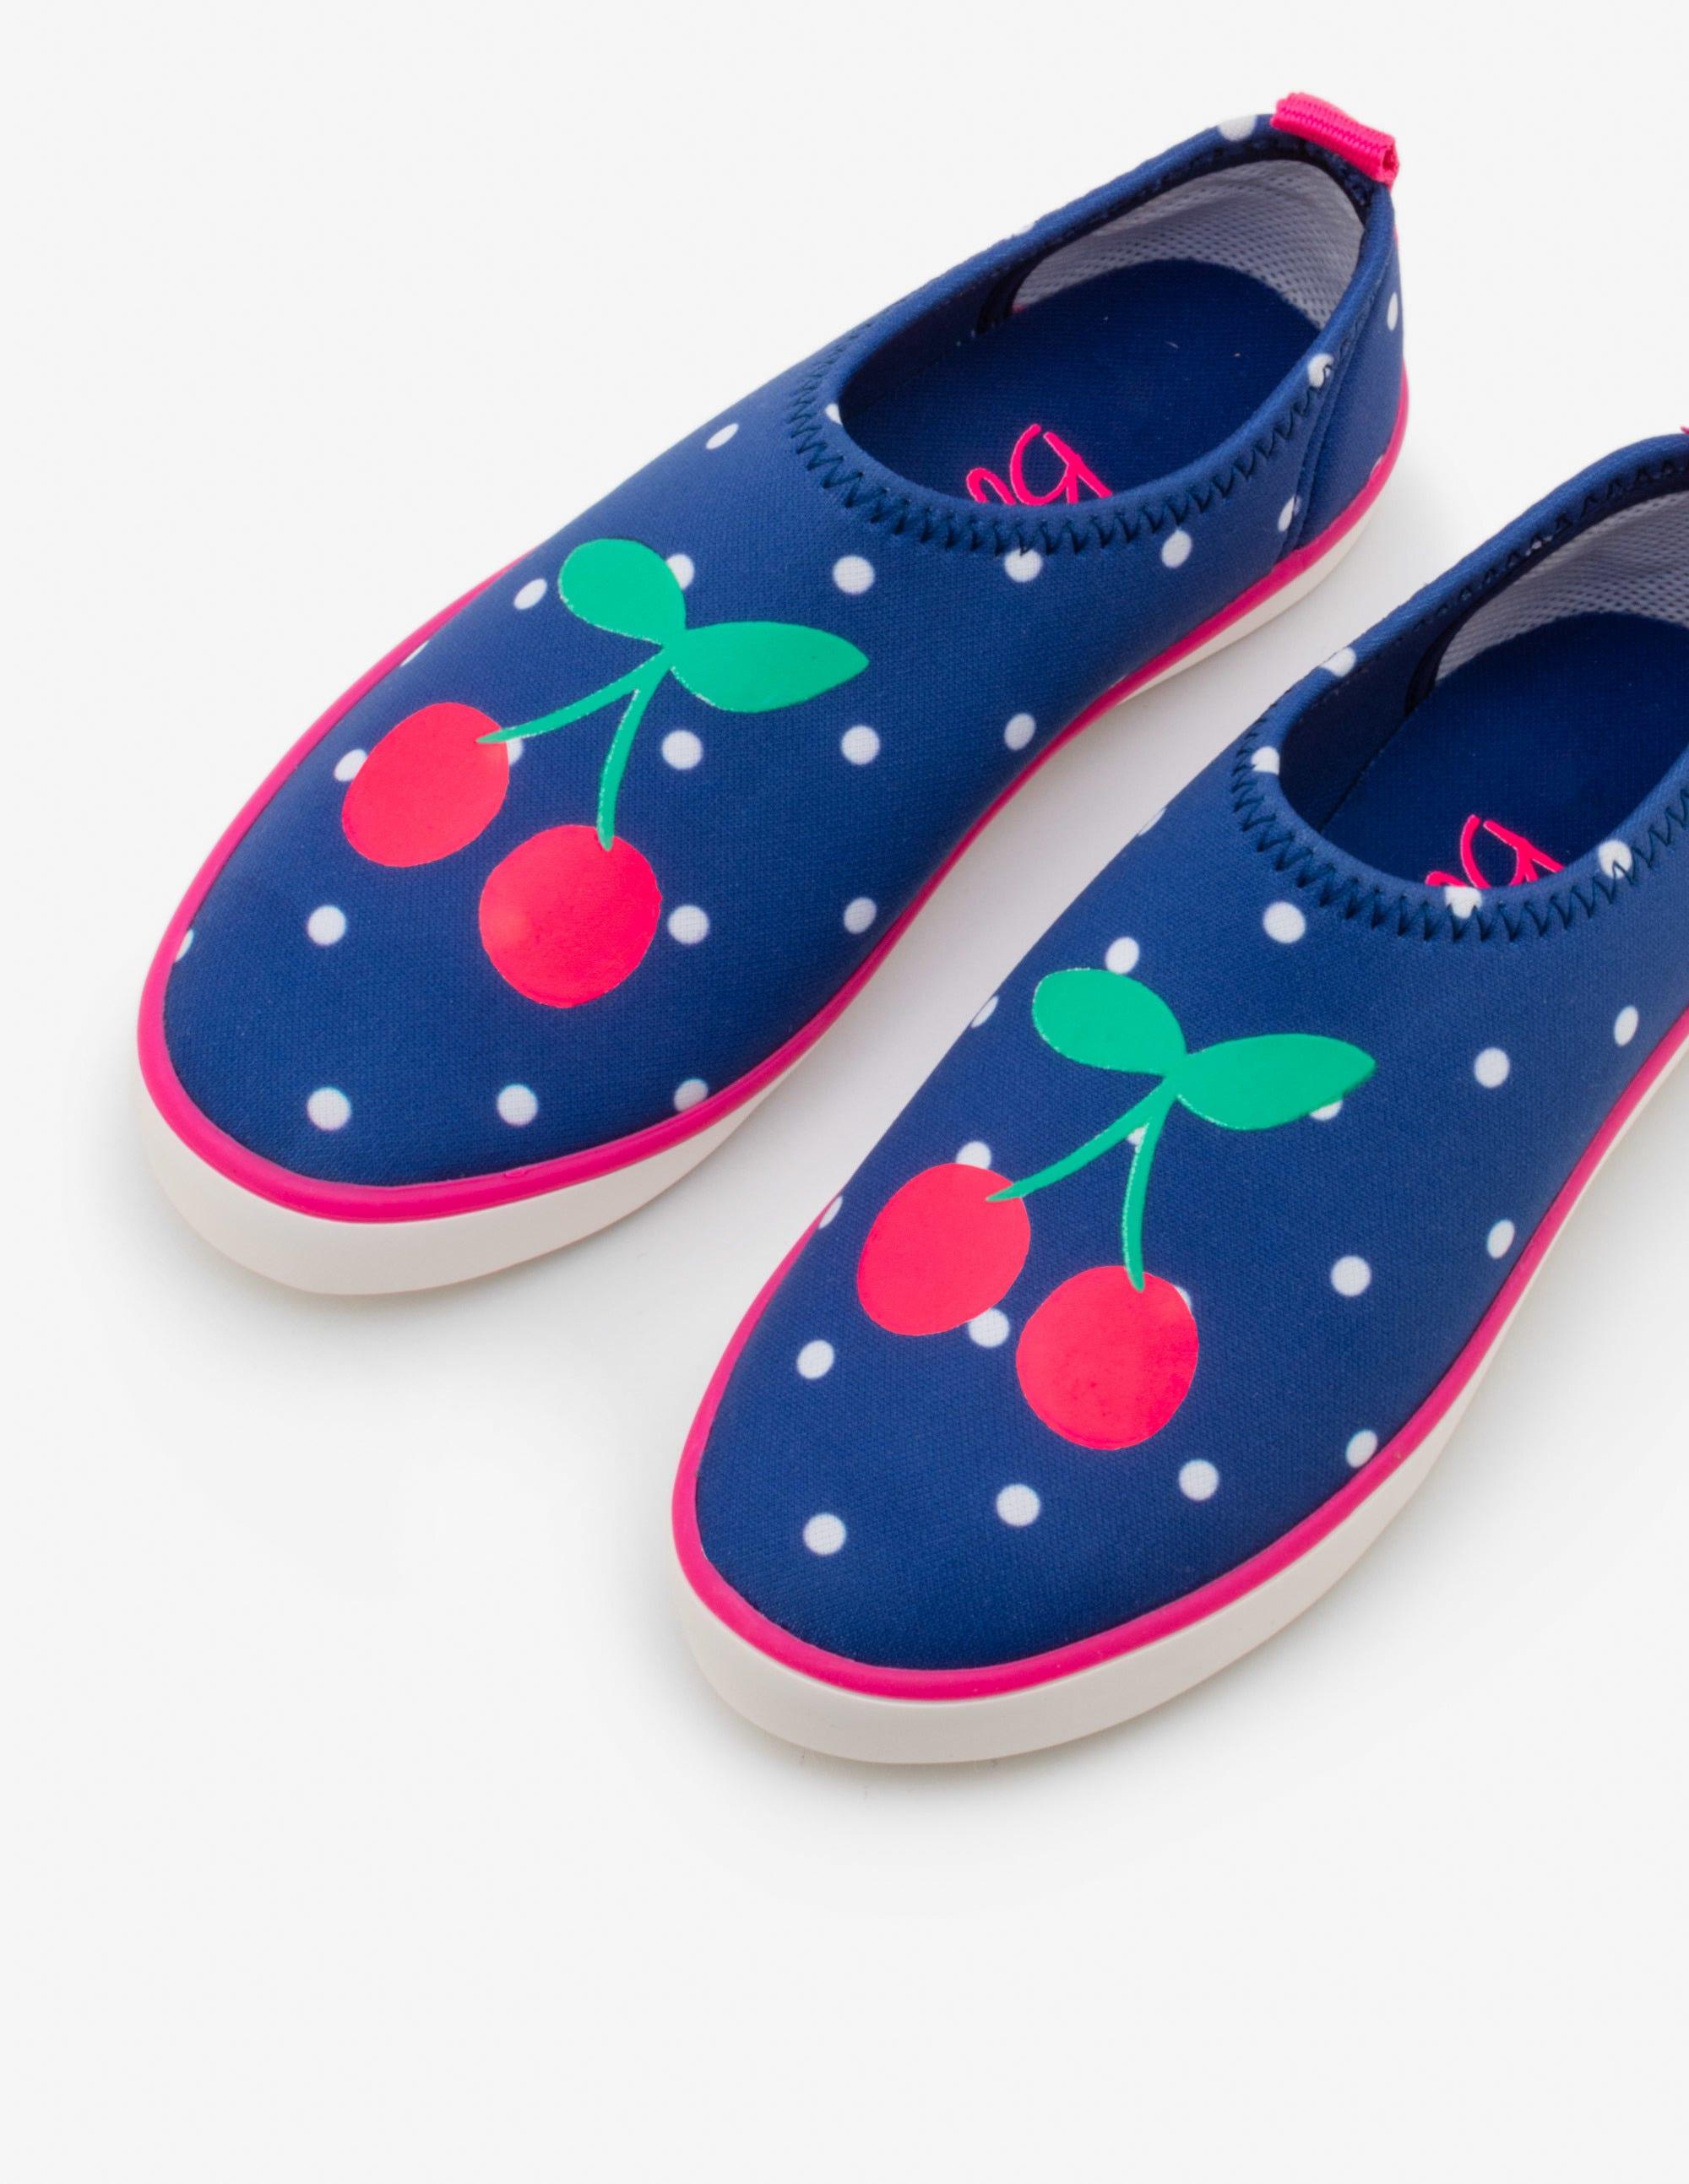 Chaussures aquatiques IND Fille Boden, Blue